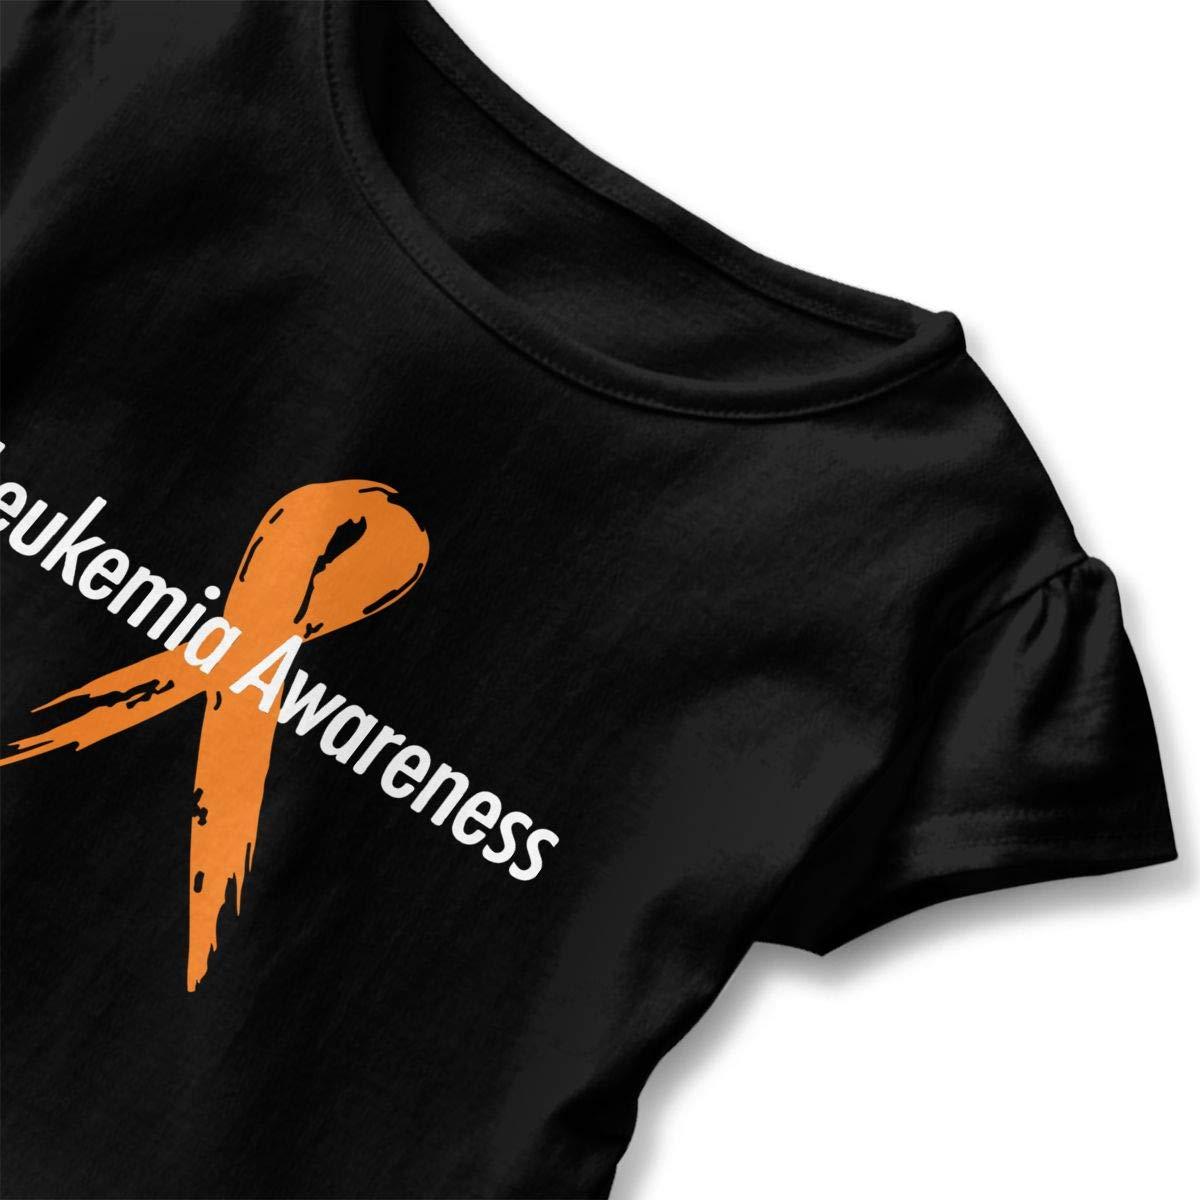 Kawaii Blouse Clothes with Falbala Zi7J9q-0 Short-Sleeve Leukemia Awareness T-Shirts for Children 2-6T